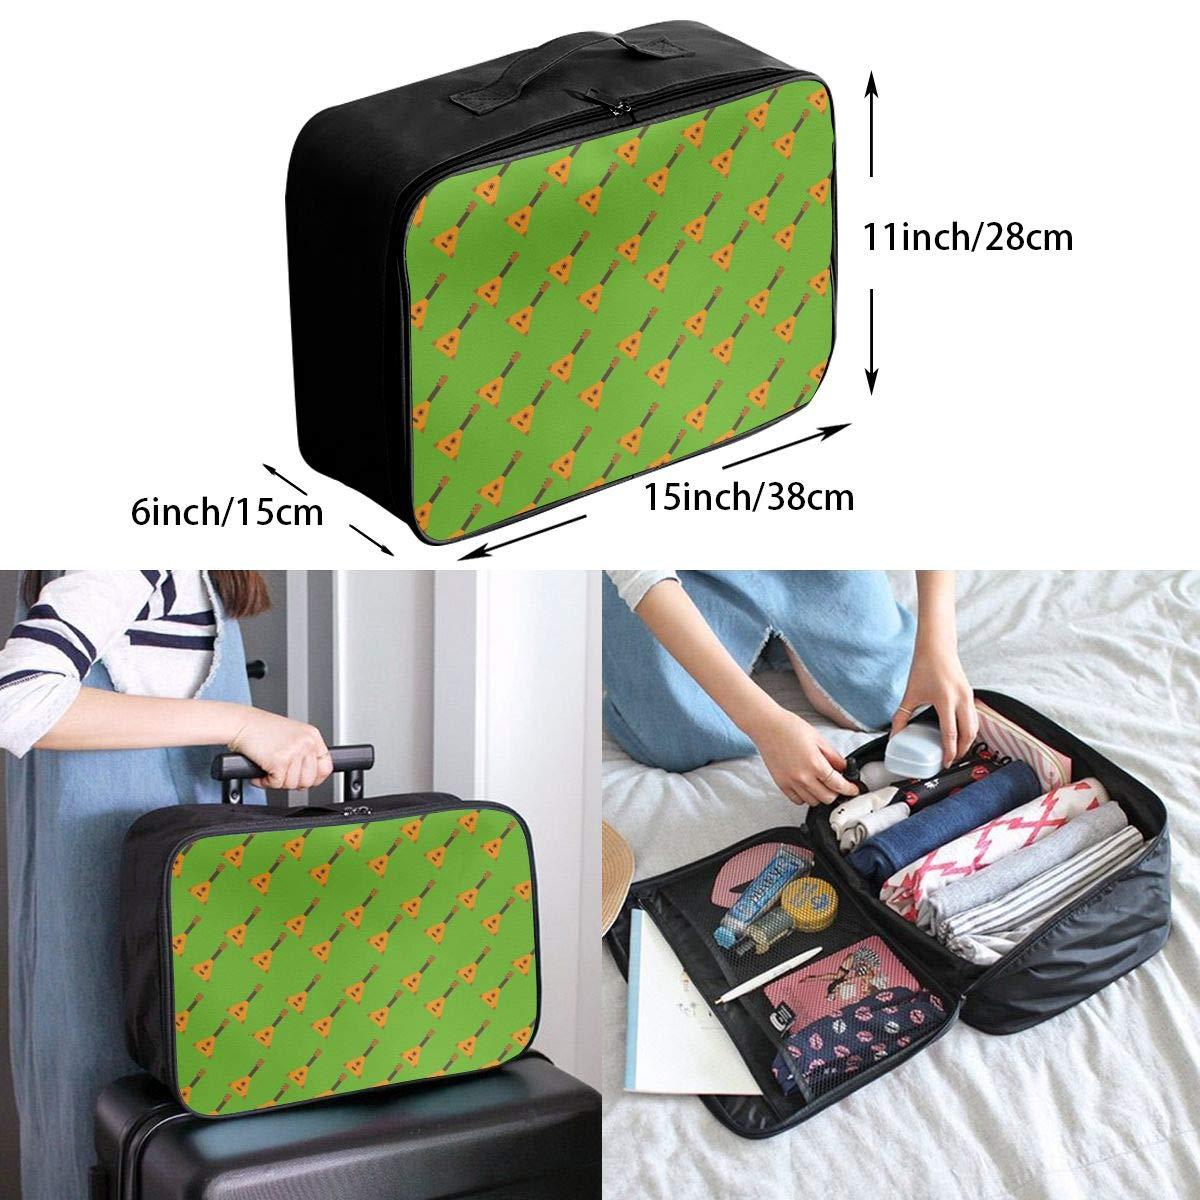 YueLJB Balalaika Lightweight Large Capacity Portable Luggage Bag Travel Duffel Bag Storage Carry Luggage Duffle Tote Bag